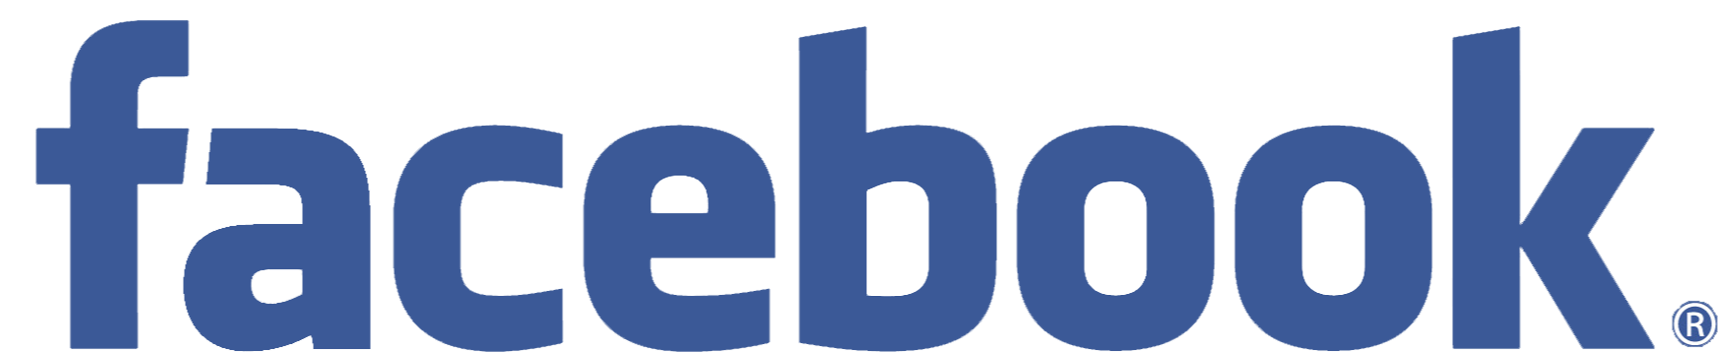 https://www.facebook.com/ElecAccShop/